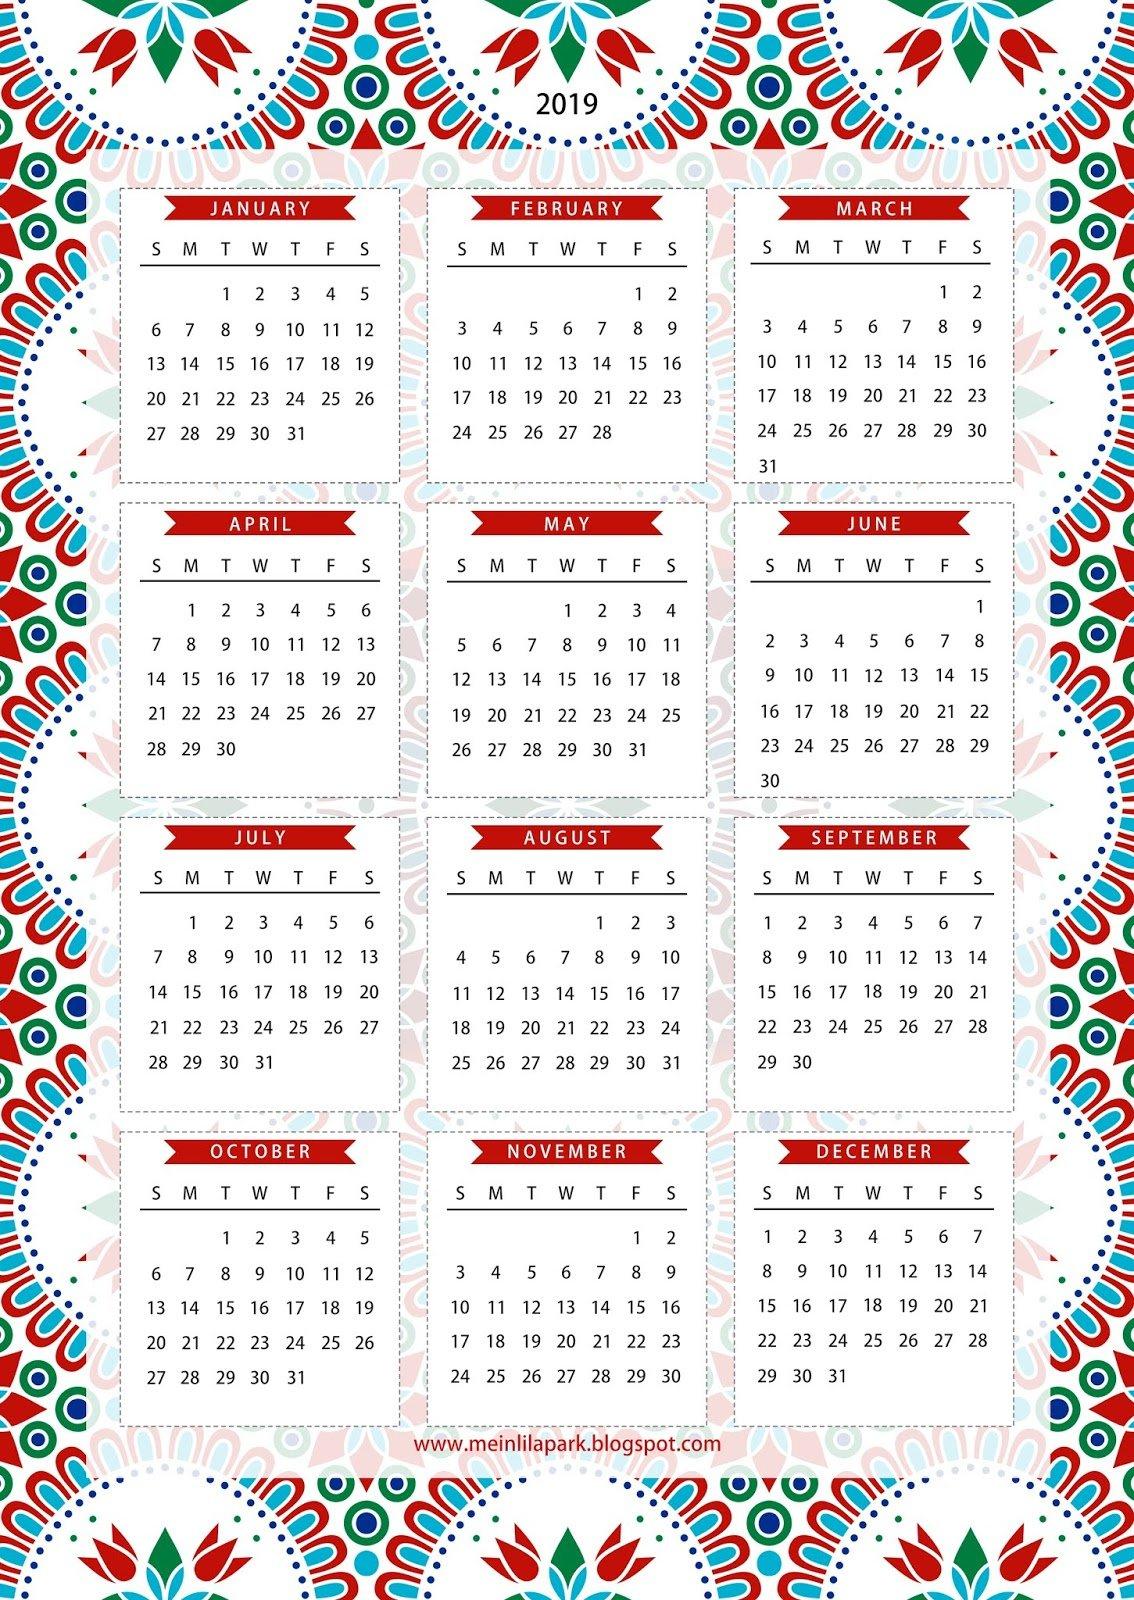 Free Printable 2019 One Page Calendar - Kalender - Freebie Free Blank Calendar Page